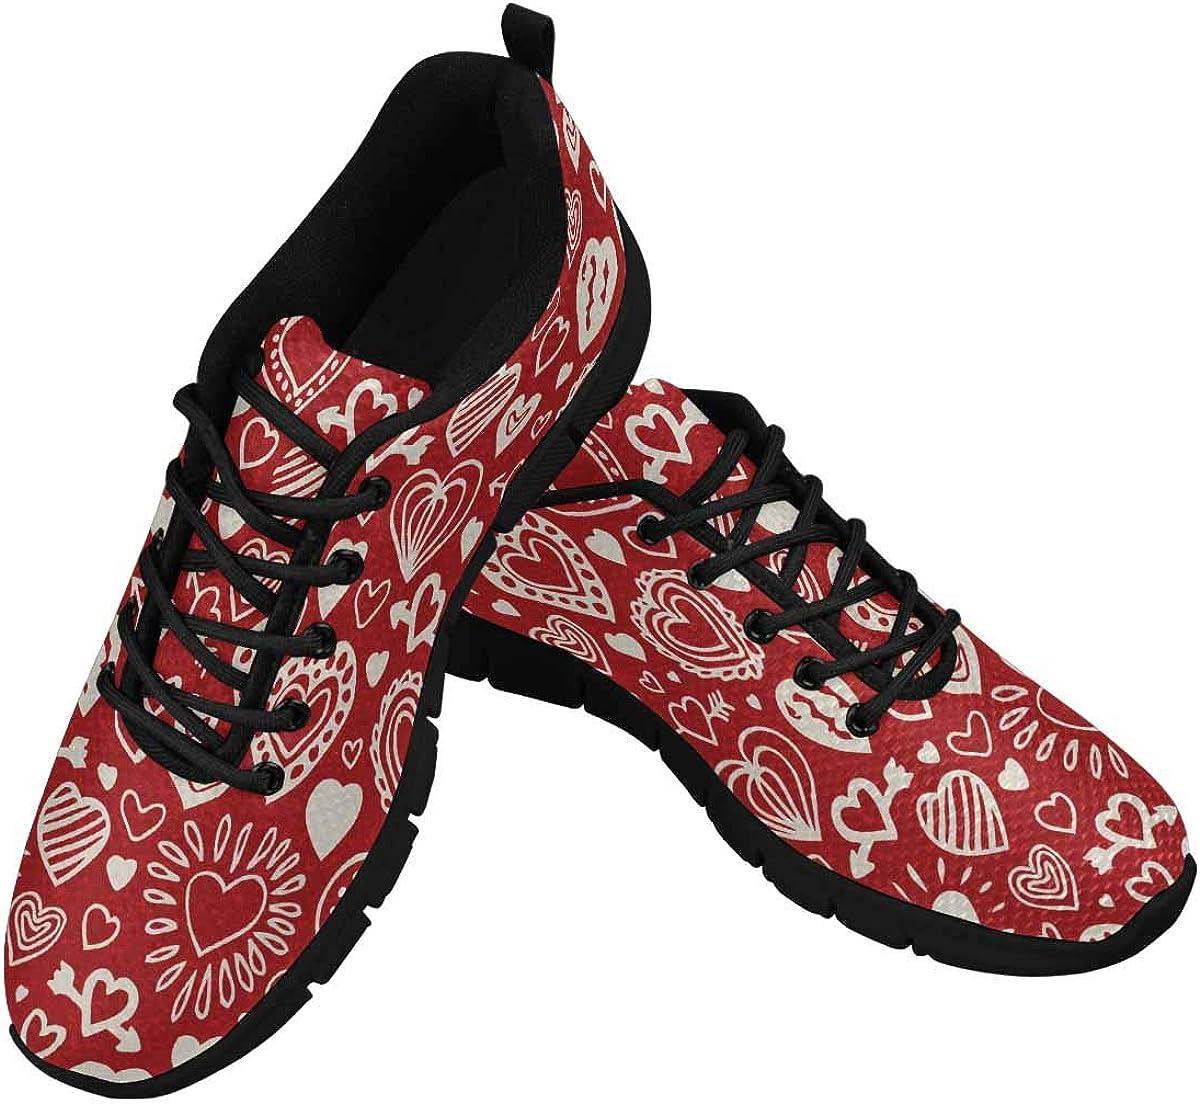 INTERESTPRINT White Hearts Pattern Women's Tennis Running Shoes Lightweight Sneakers